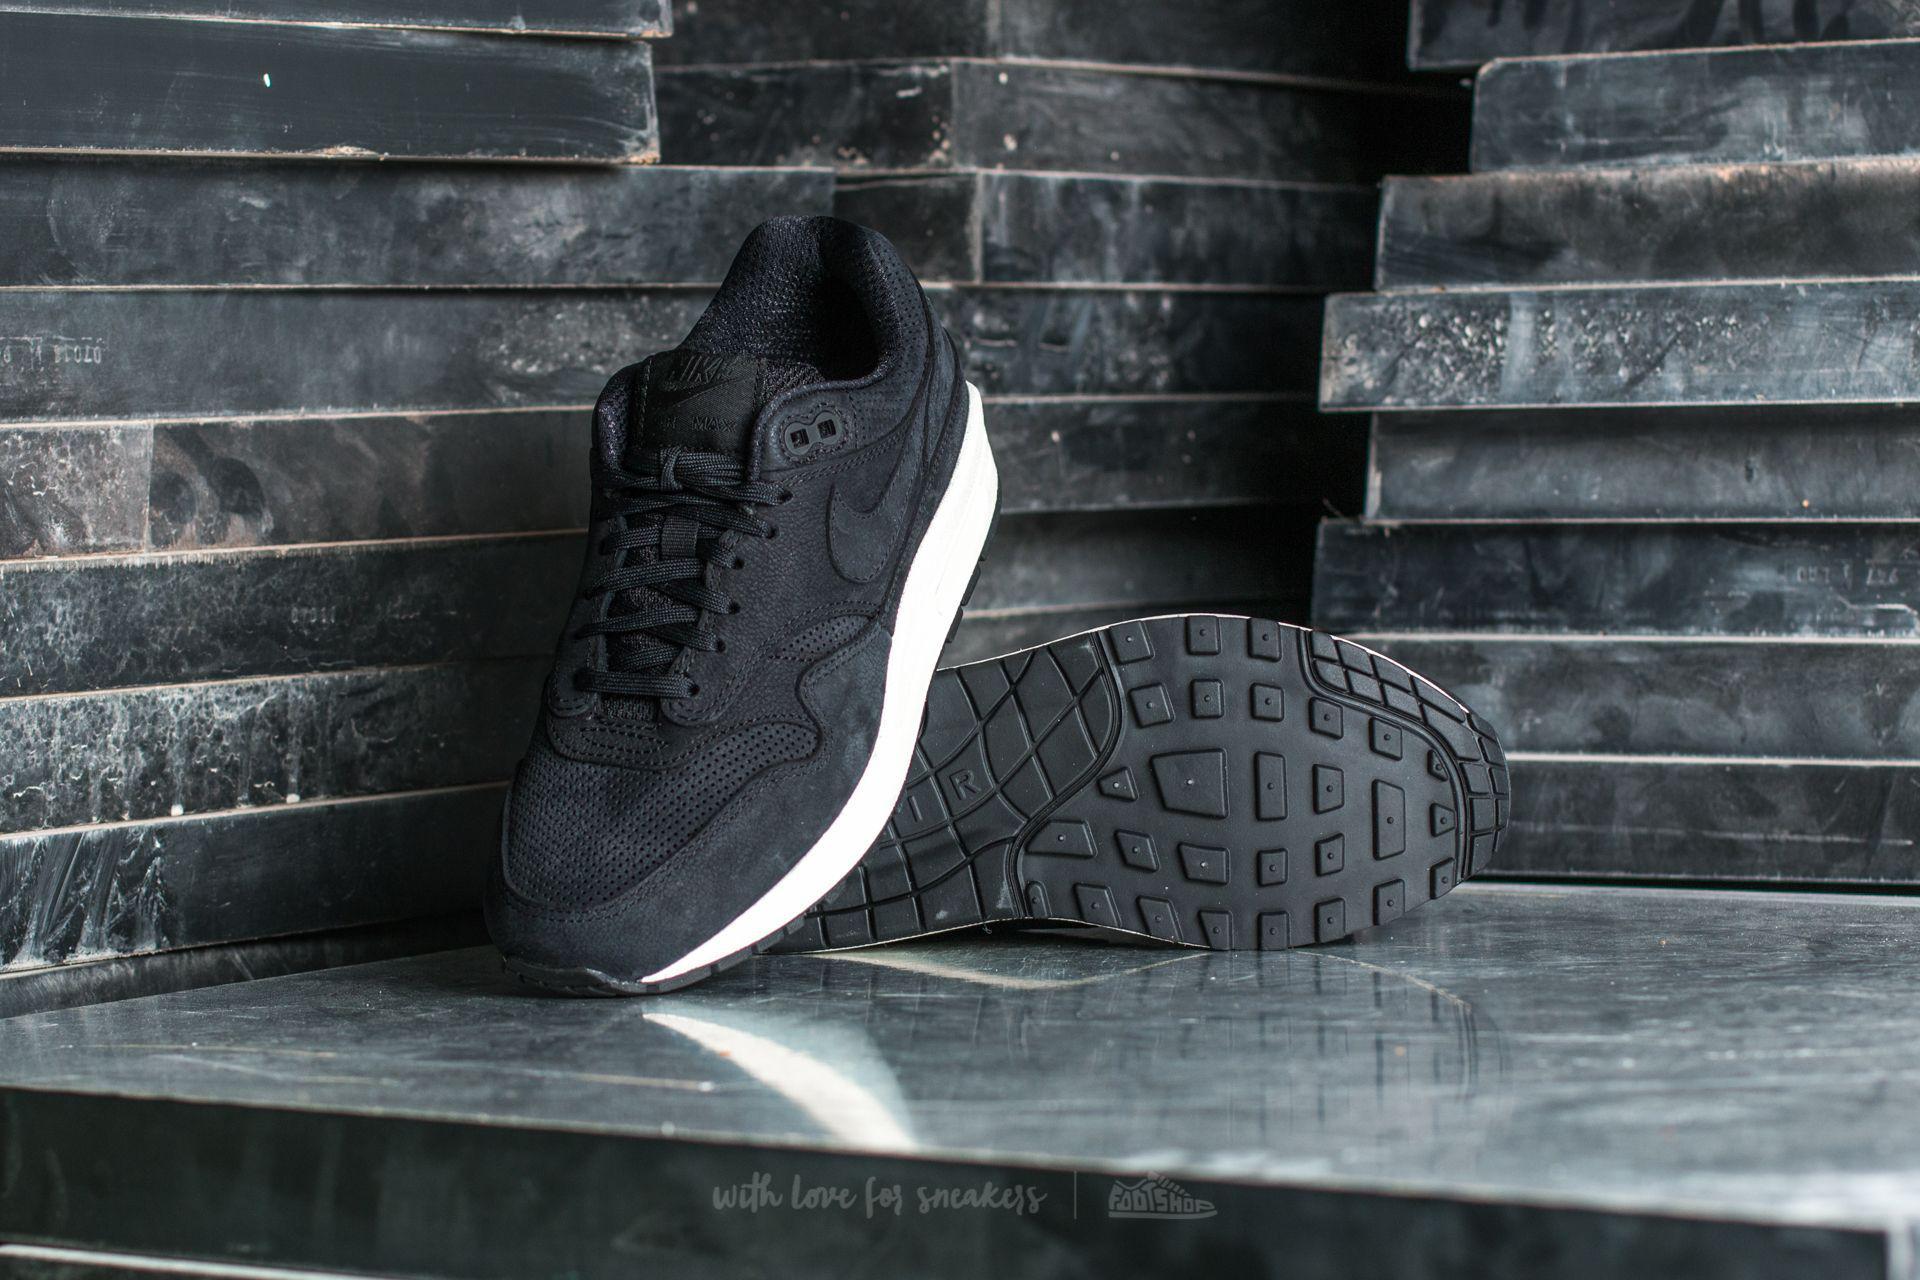 78af6d943c Gallery. Previously sold at: Footshop · Women's Nike Air Max Women's Nike  Air Max 1